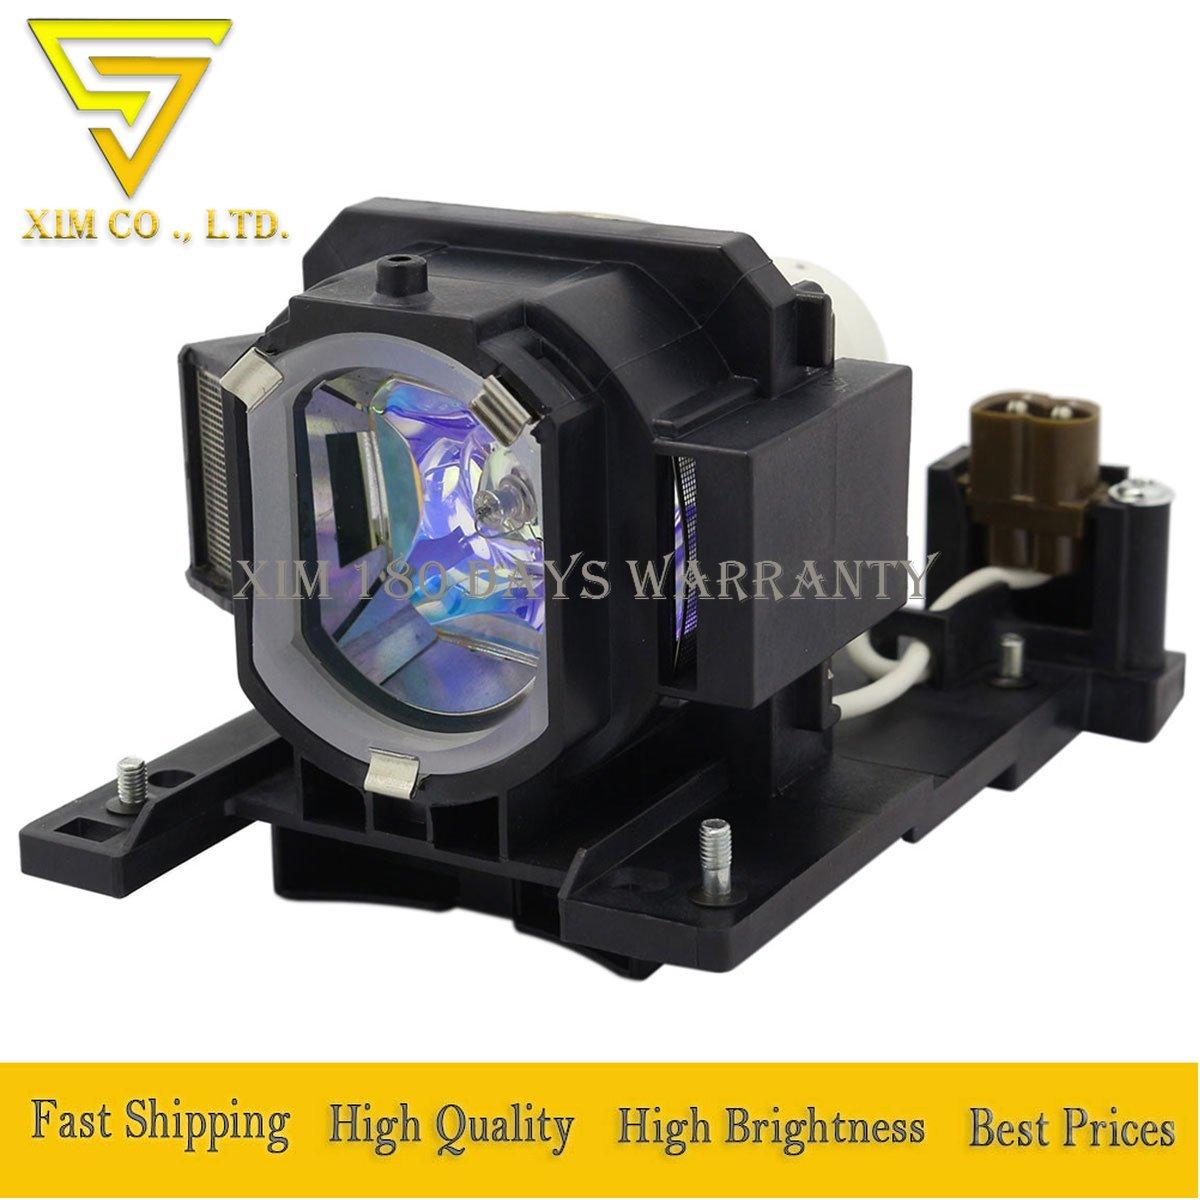 RLC-054 Replacement Projector Lamp Bulb For ViewSonic PJL7211; VS12890; RLC-054 Projectors